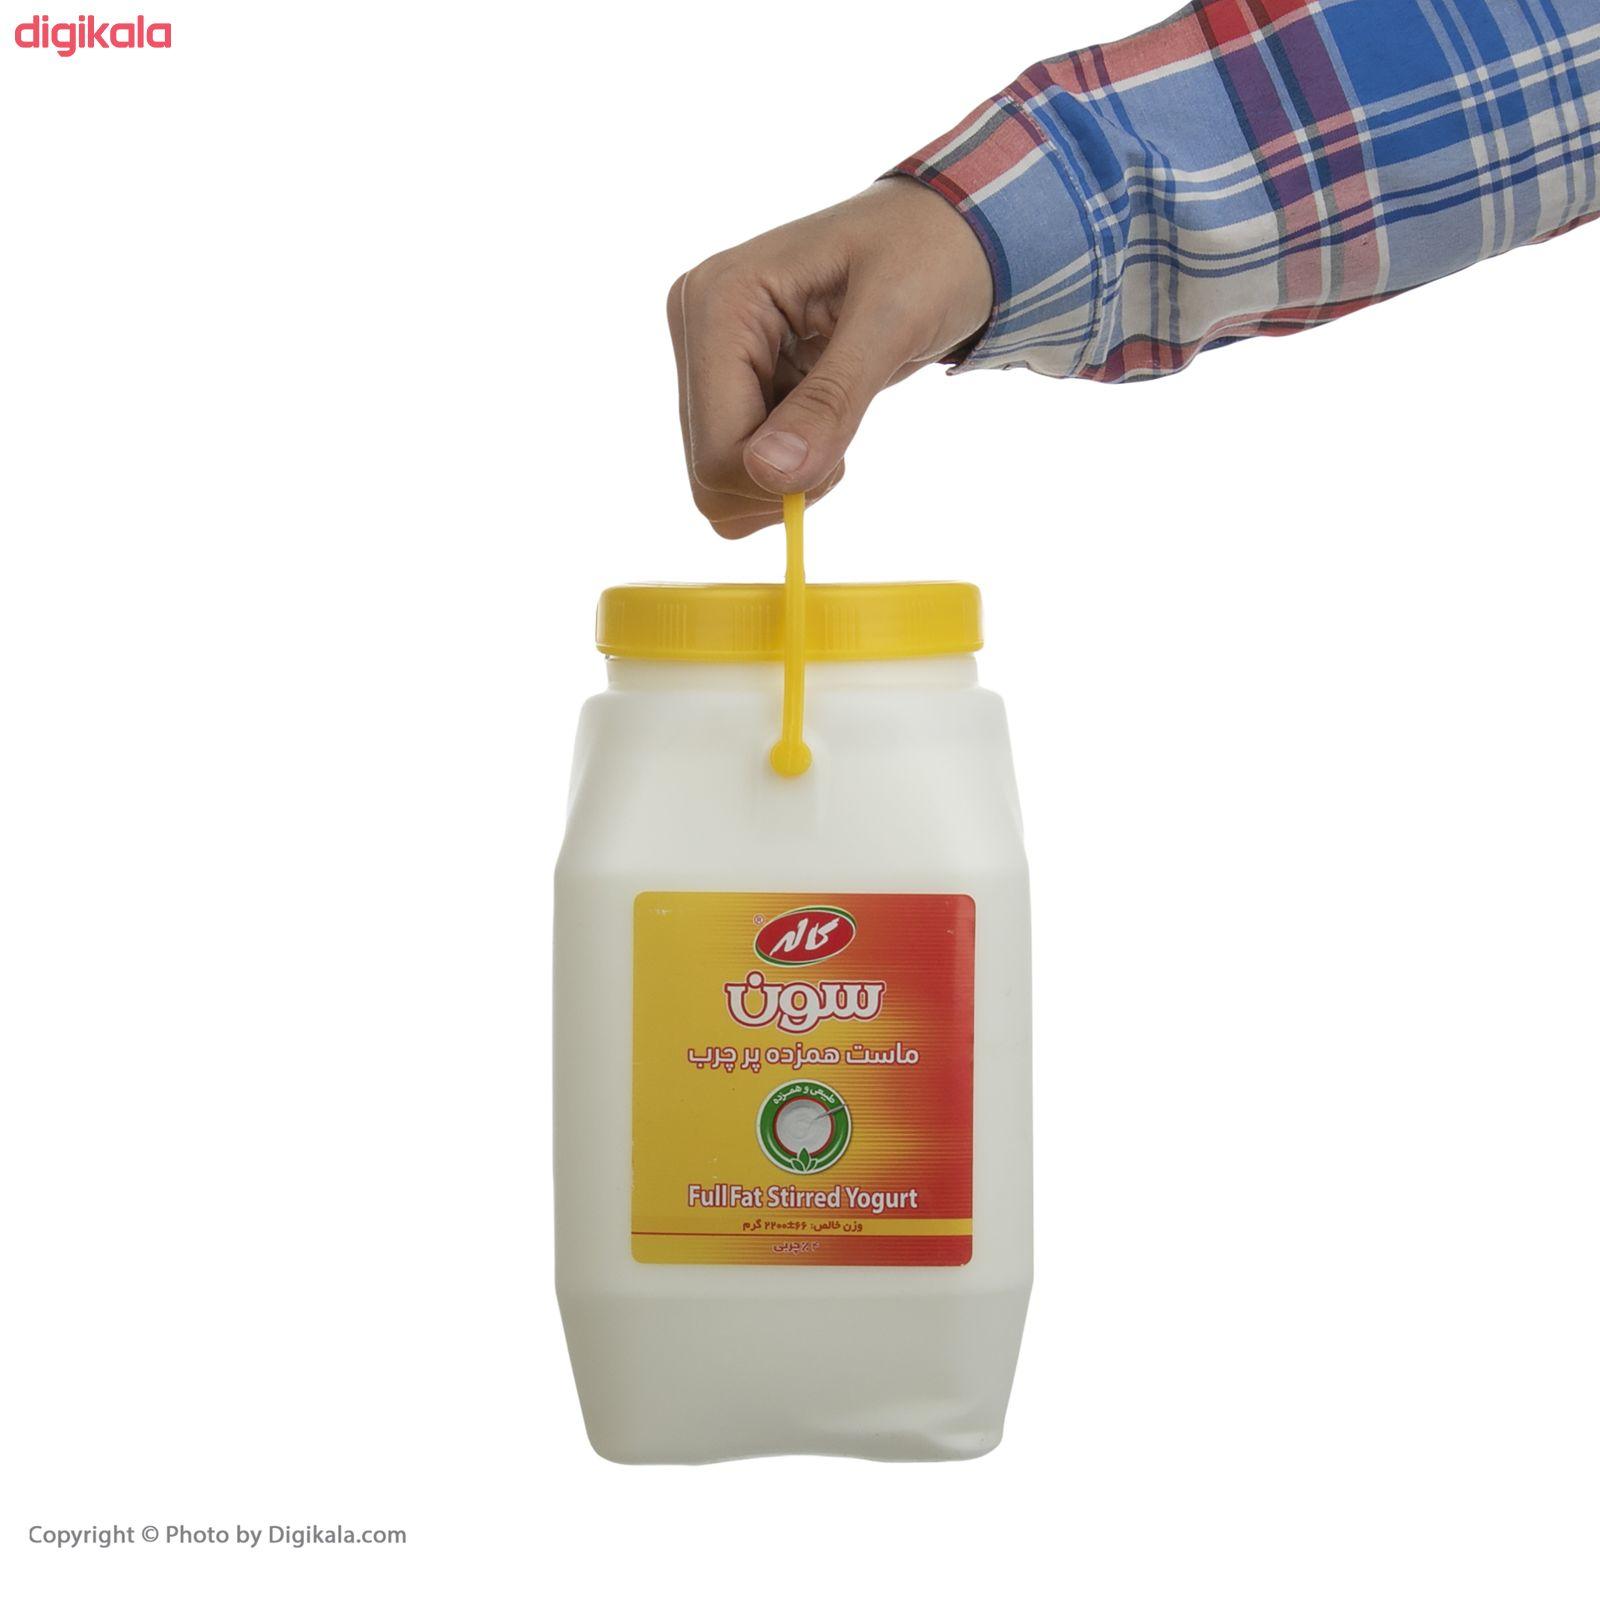 ماست سون پر چرب کاله مقدار 2.2 کیلوگرم main 1 7